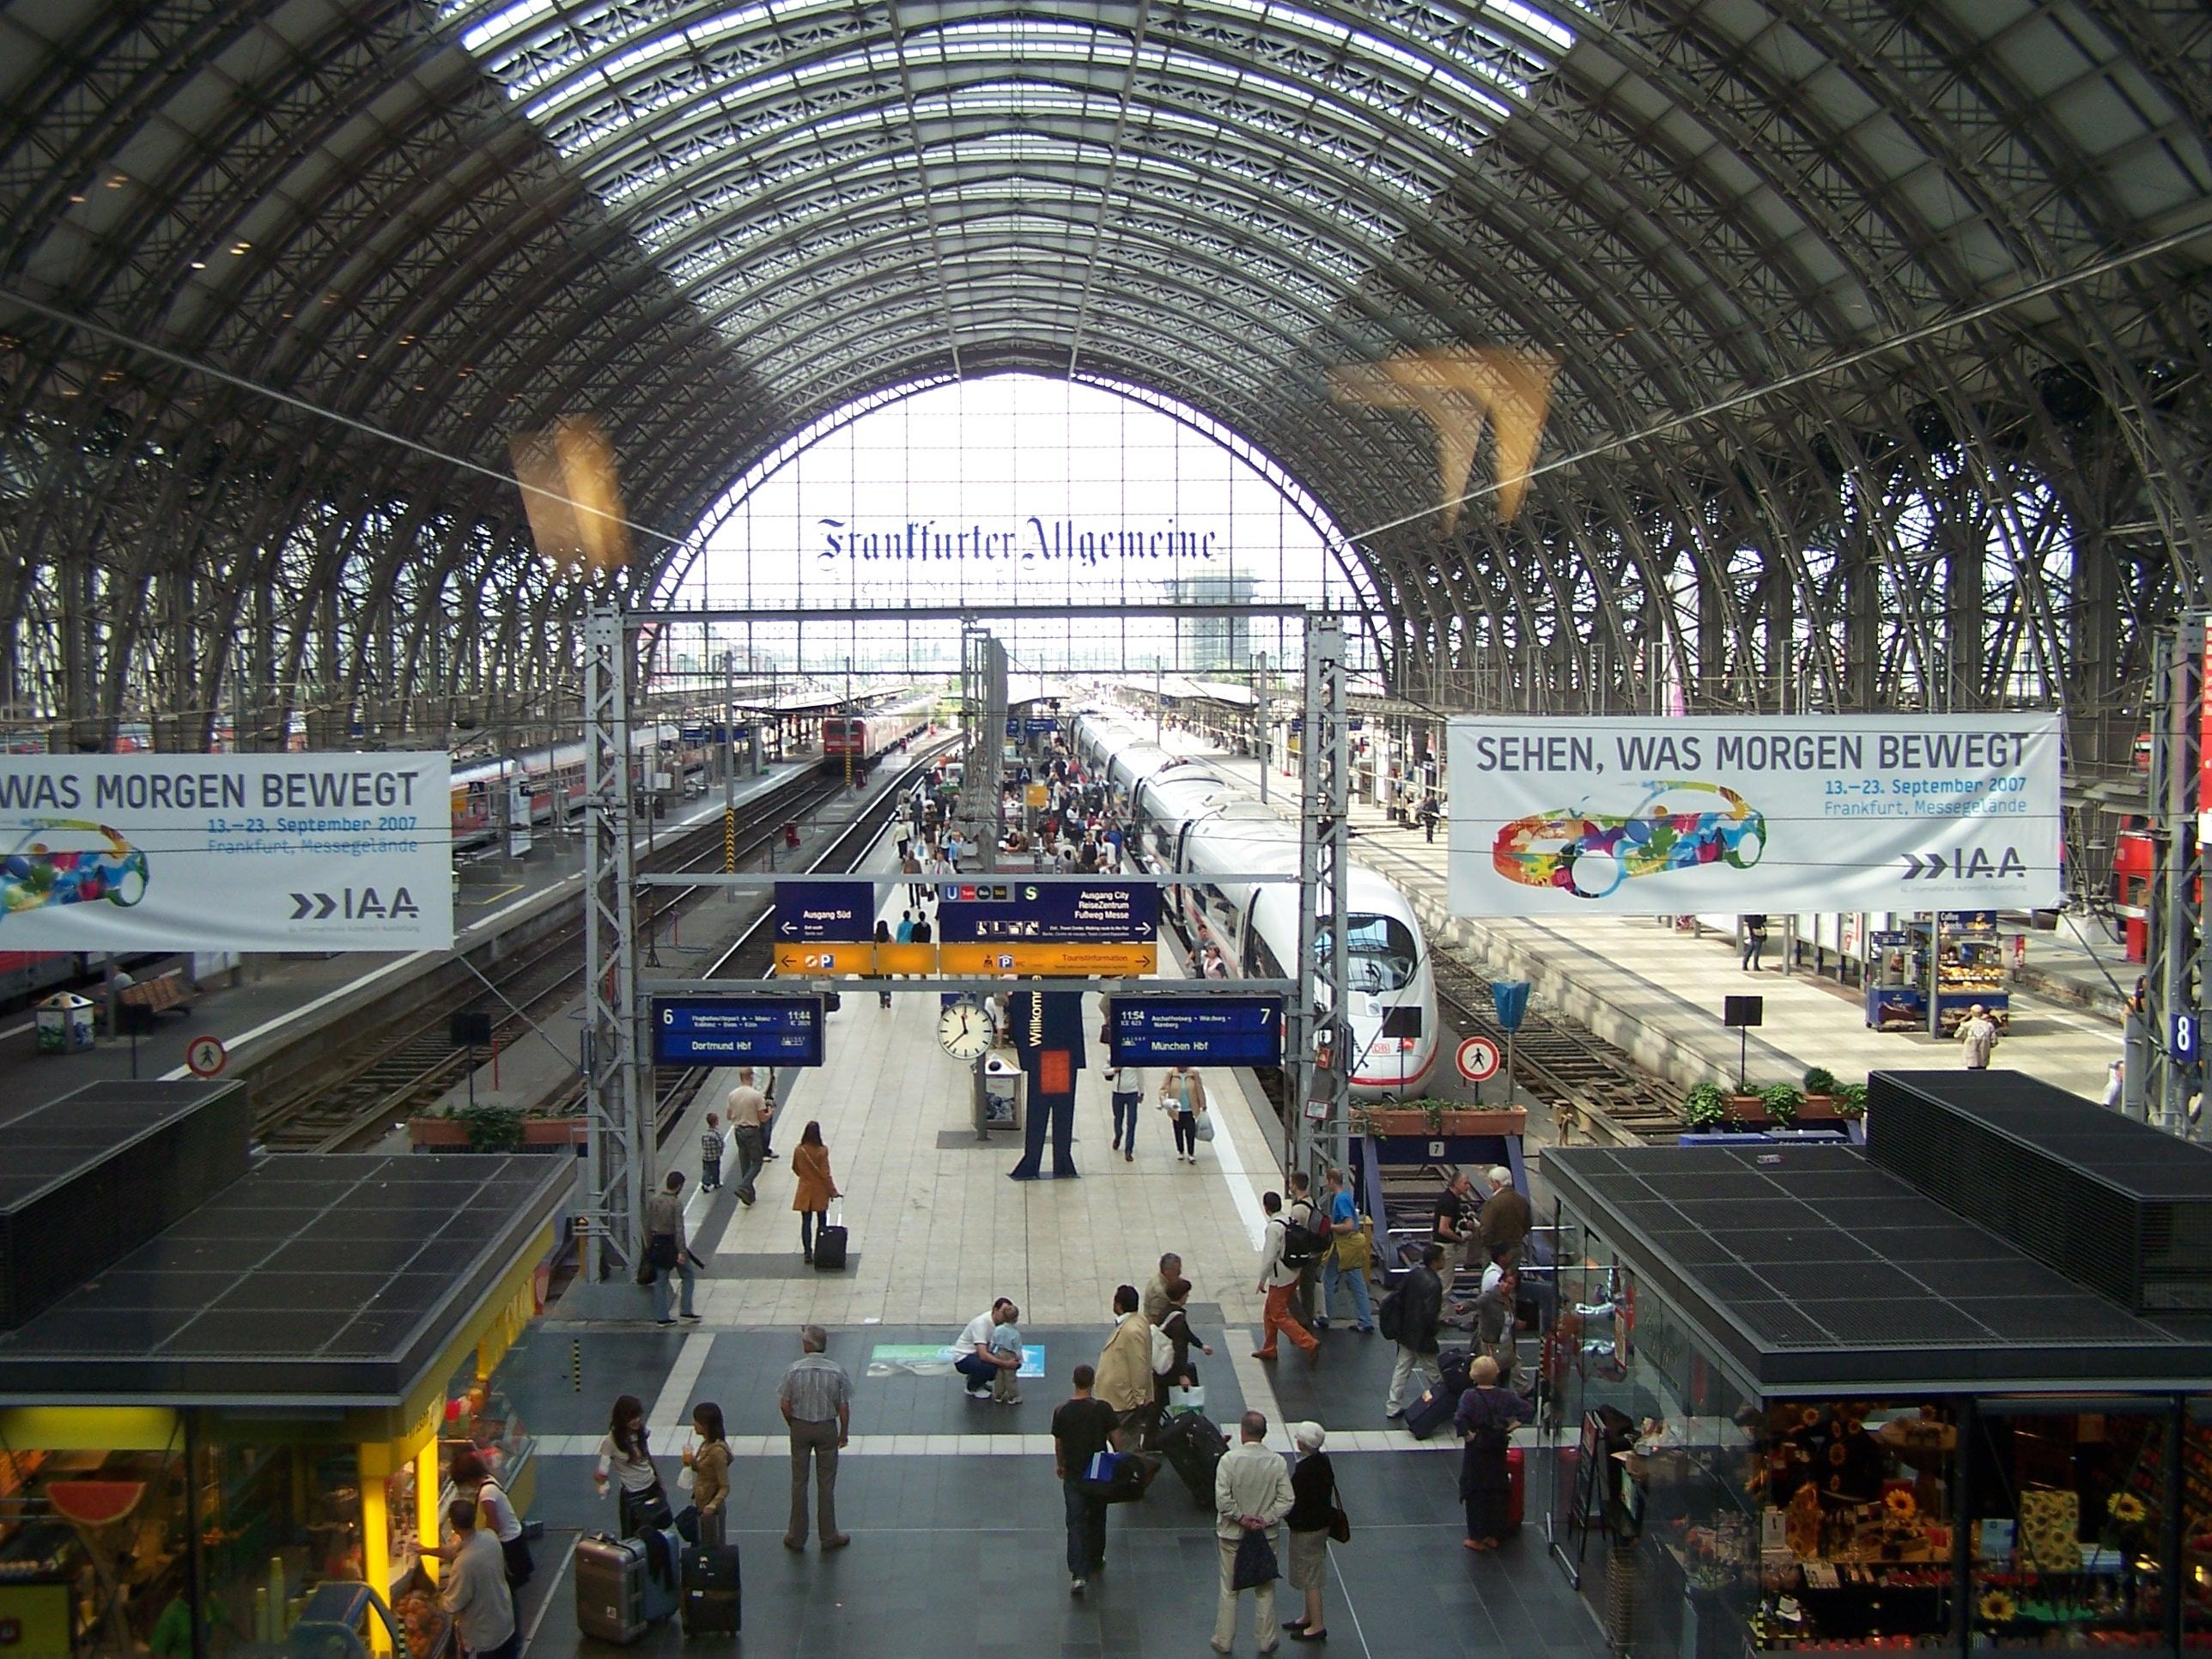 Frankfurt Main Hauptbahnhof German For Frankfurt Main